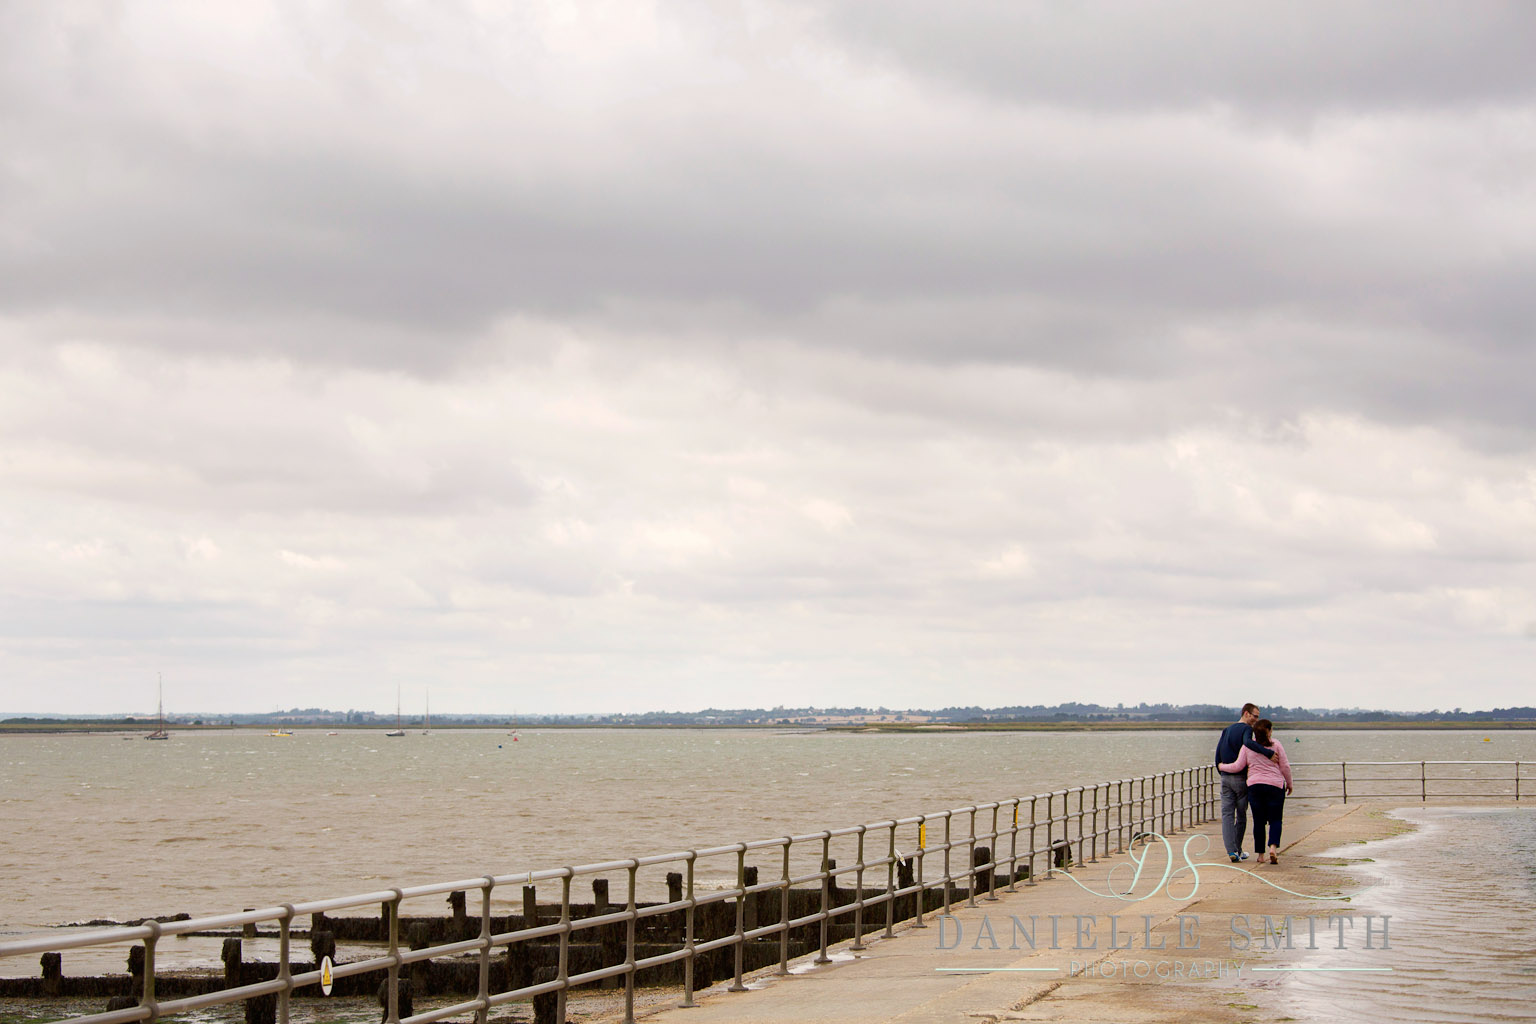 couple walking along by the seaside